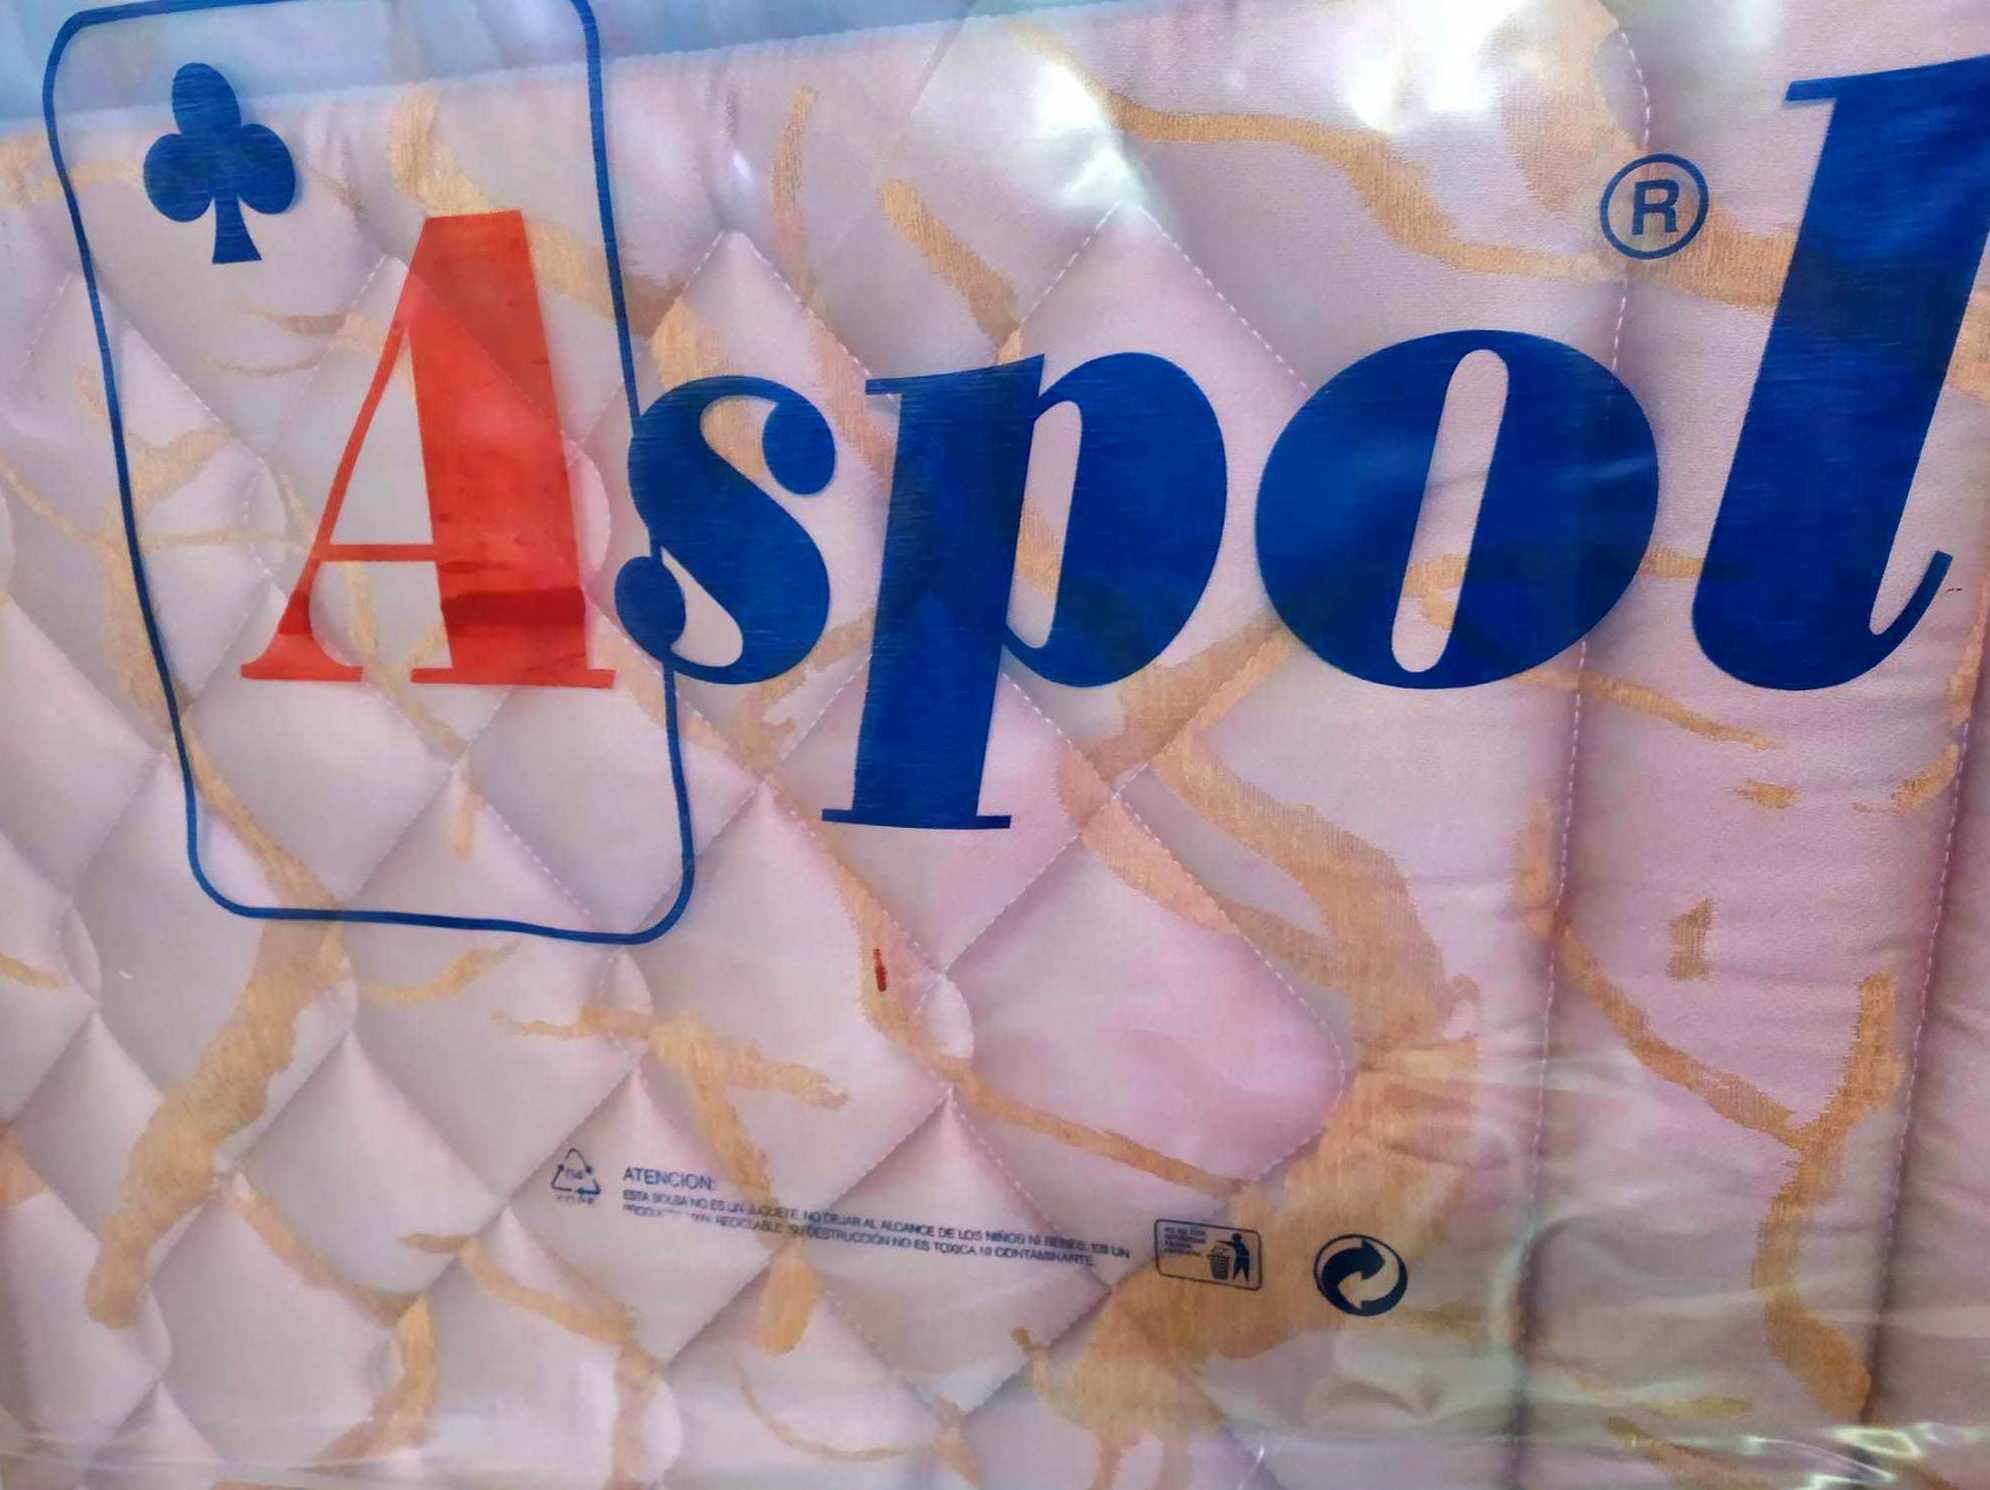 ASPOL MADRID